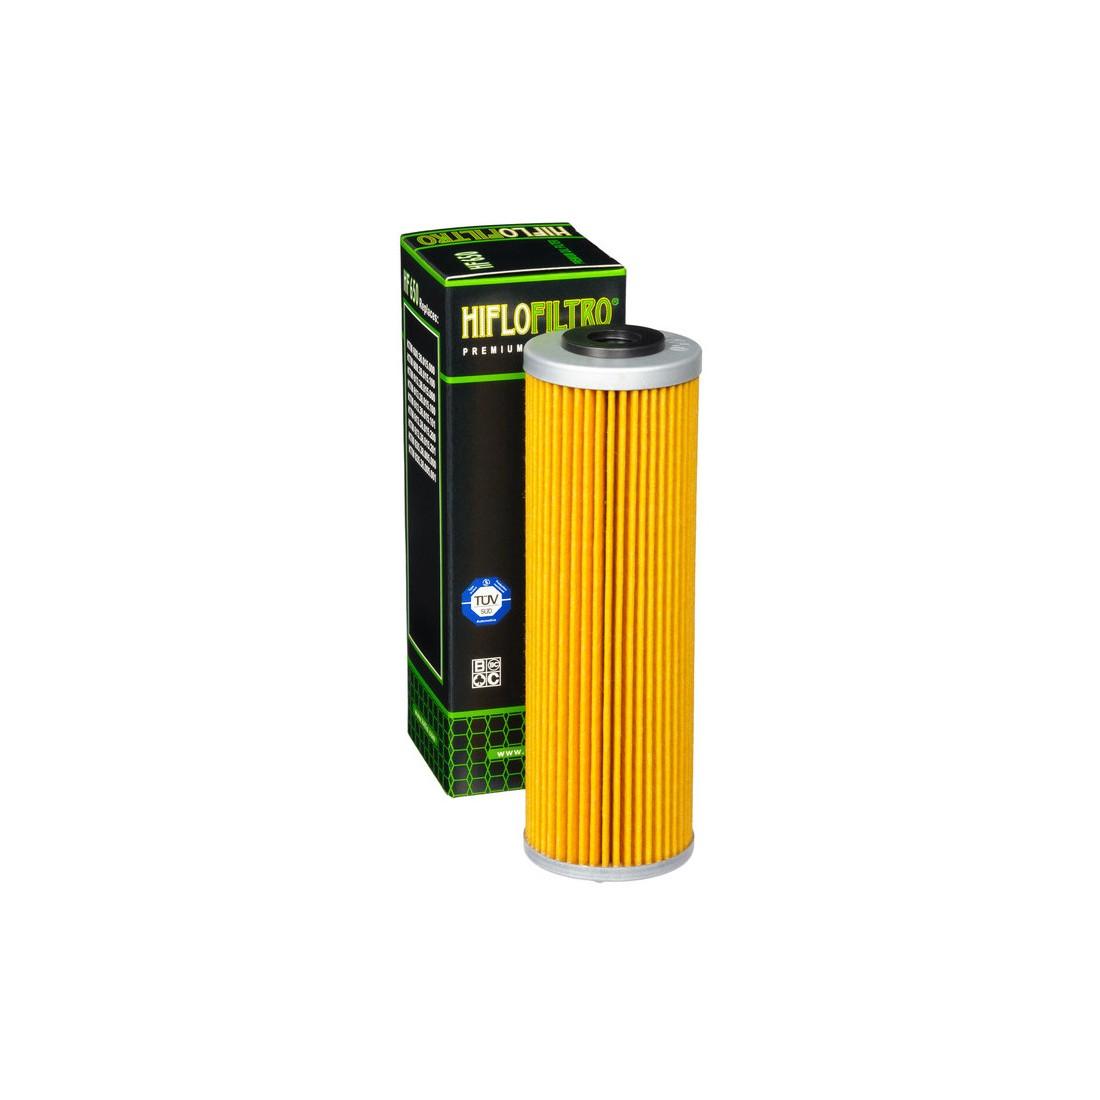 Filtro Aceite Hiflofiltro HF650